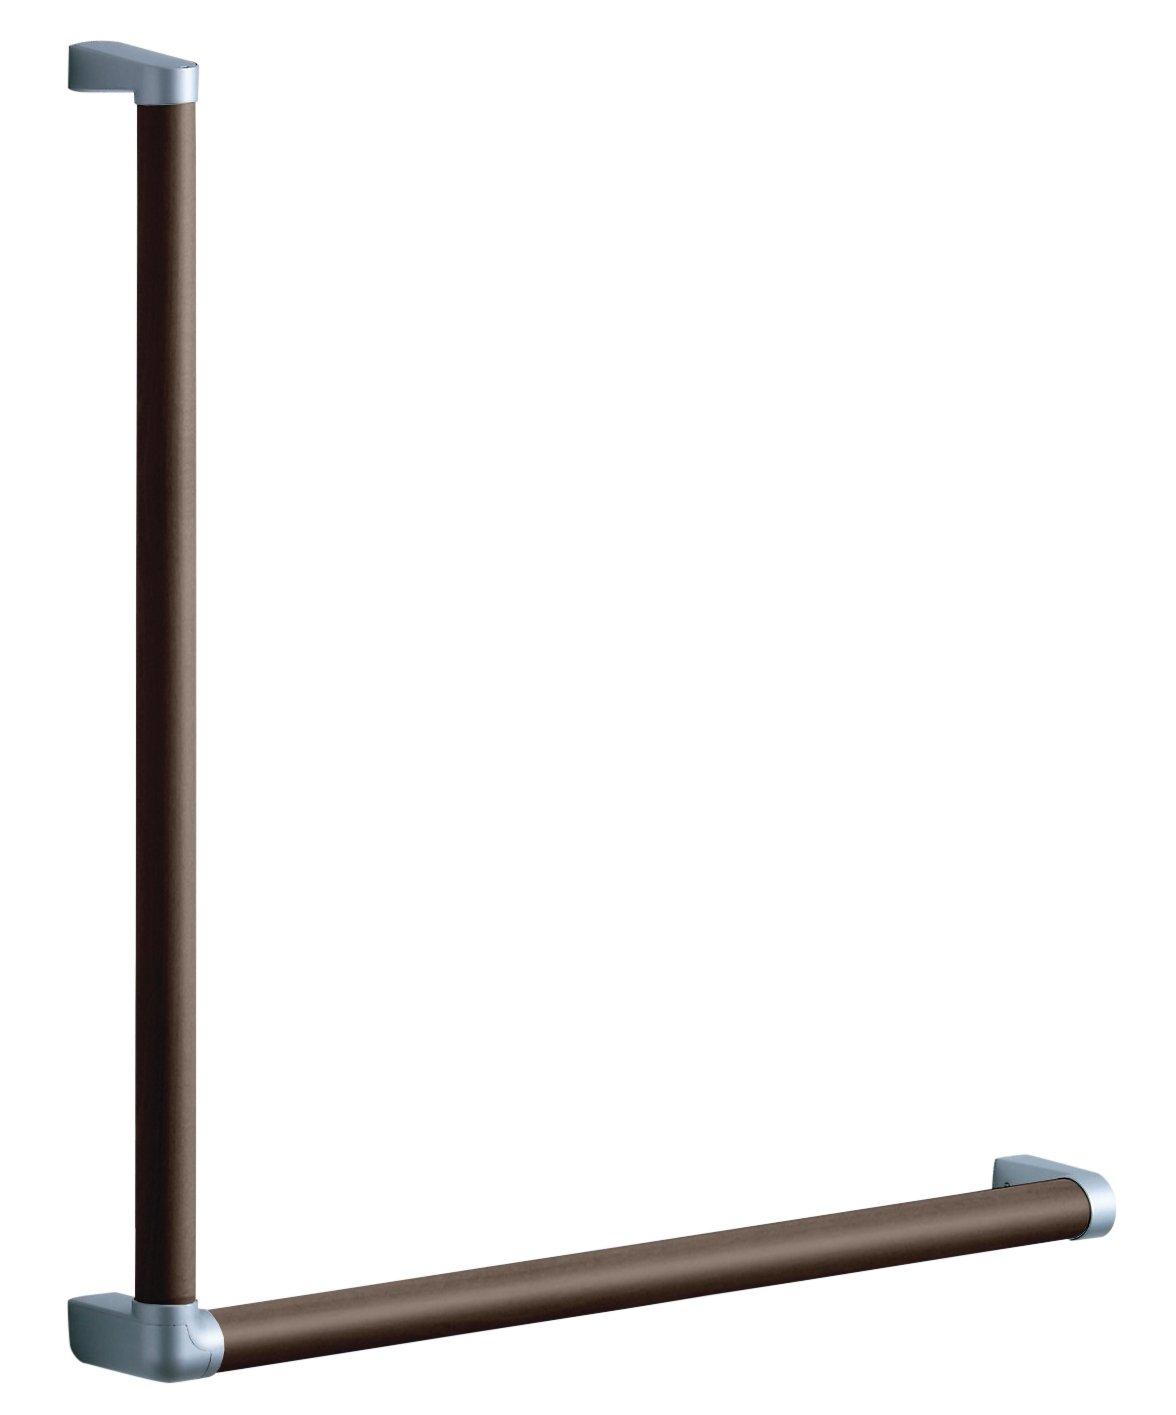 TOTO 天然木手すり 61シリーズ (Lタイプ) 61.7×61.7cm ダルブラウン YHB601LA#MWW B06XPZGHV2 ダルブラウン ダルブラウン